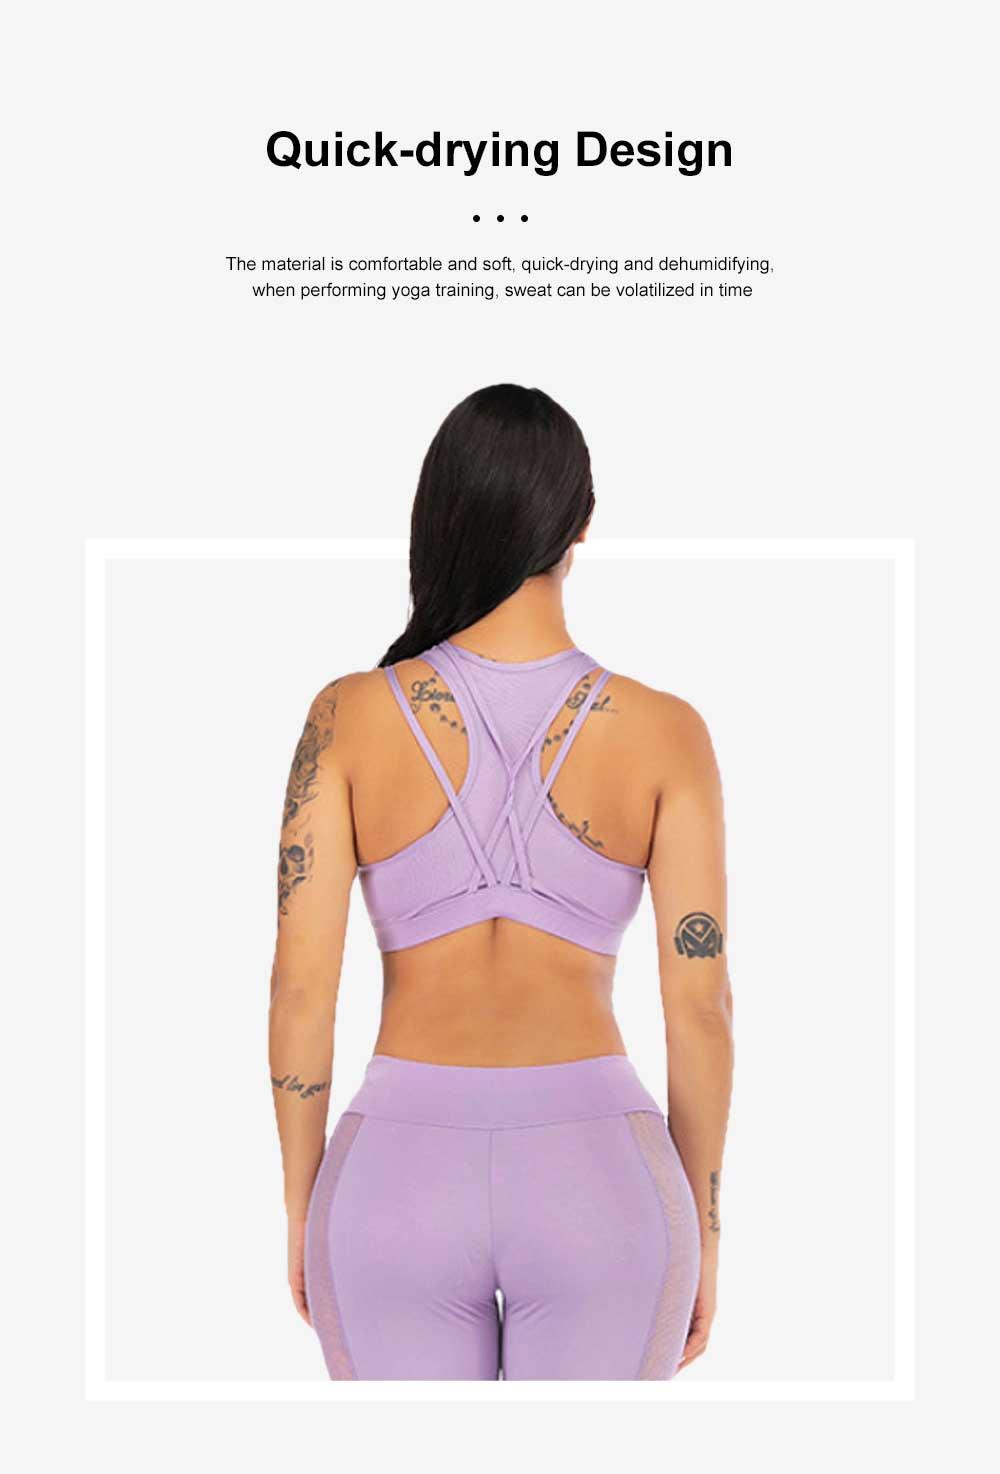 Fashion Sexy Women Two Piece Sport Bra Pants Yoga Fitness Hip Pants Set Cross Straps Hollow Matching Mesh Lady Wear Set 3